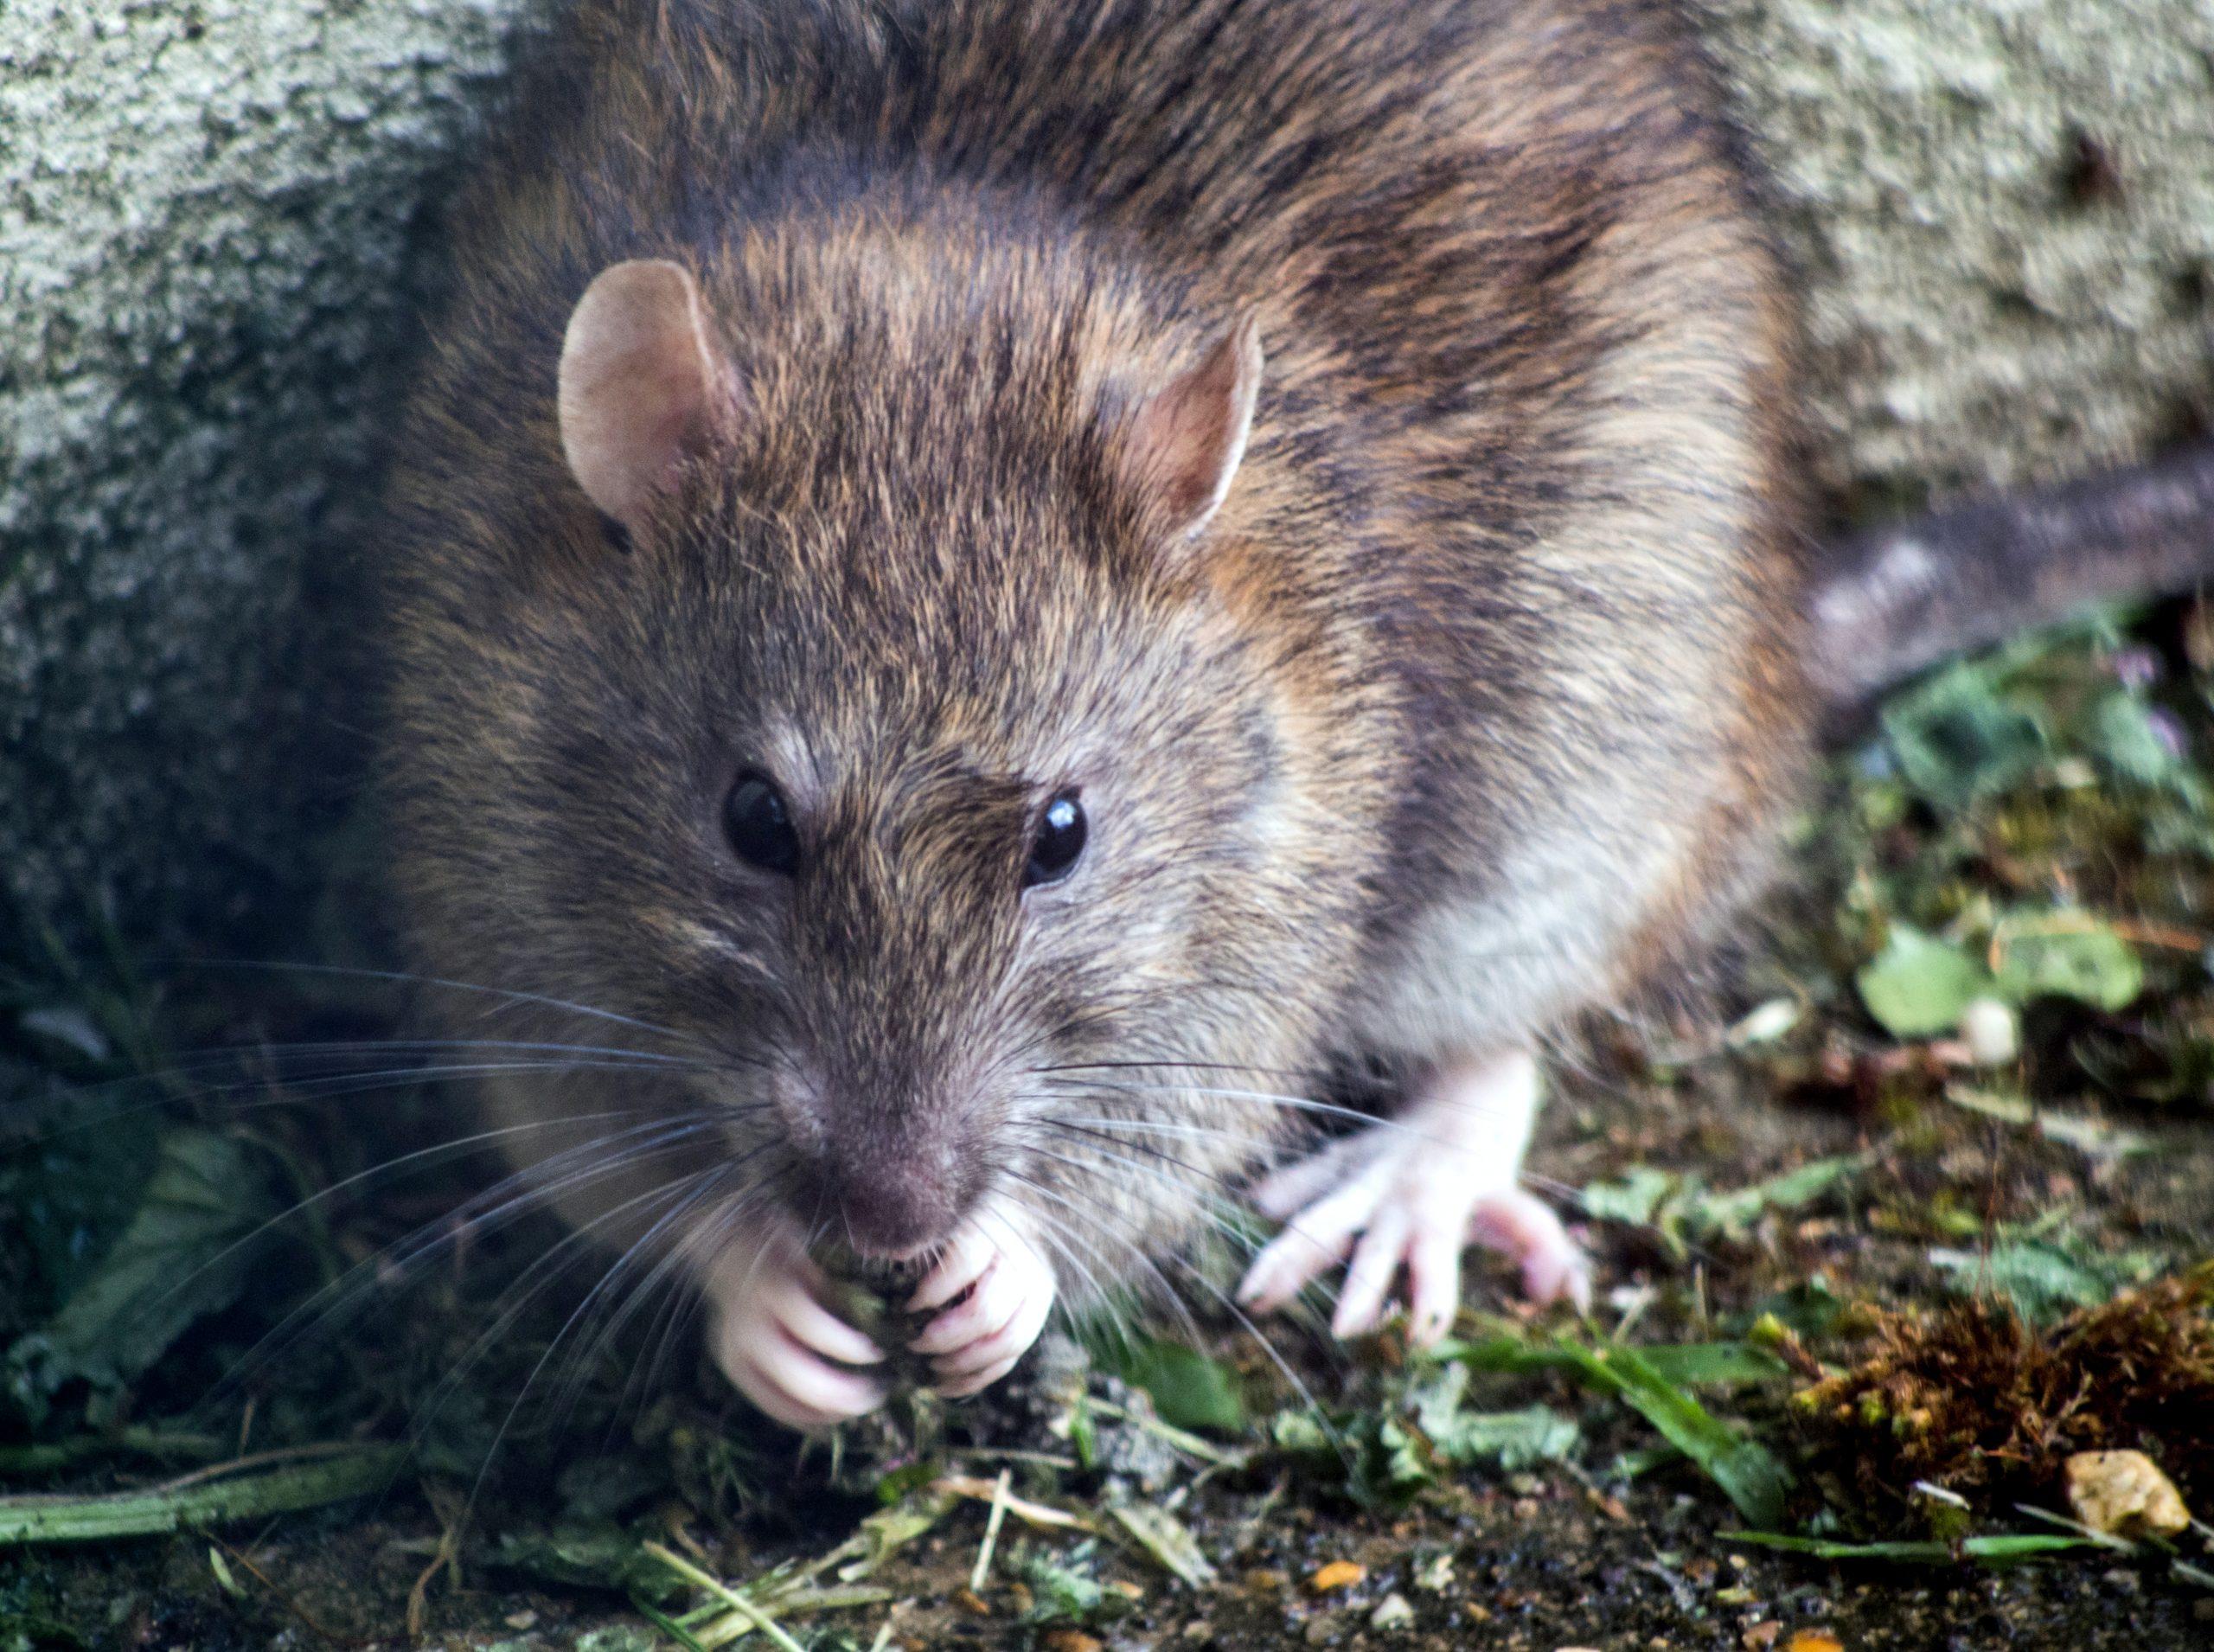 Pest Control - close up of a gray rat